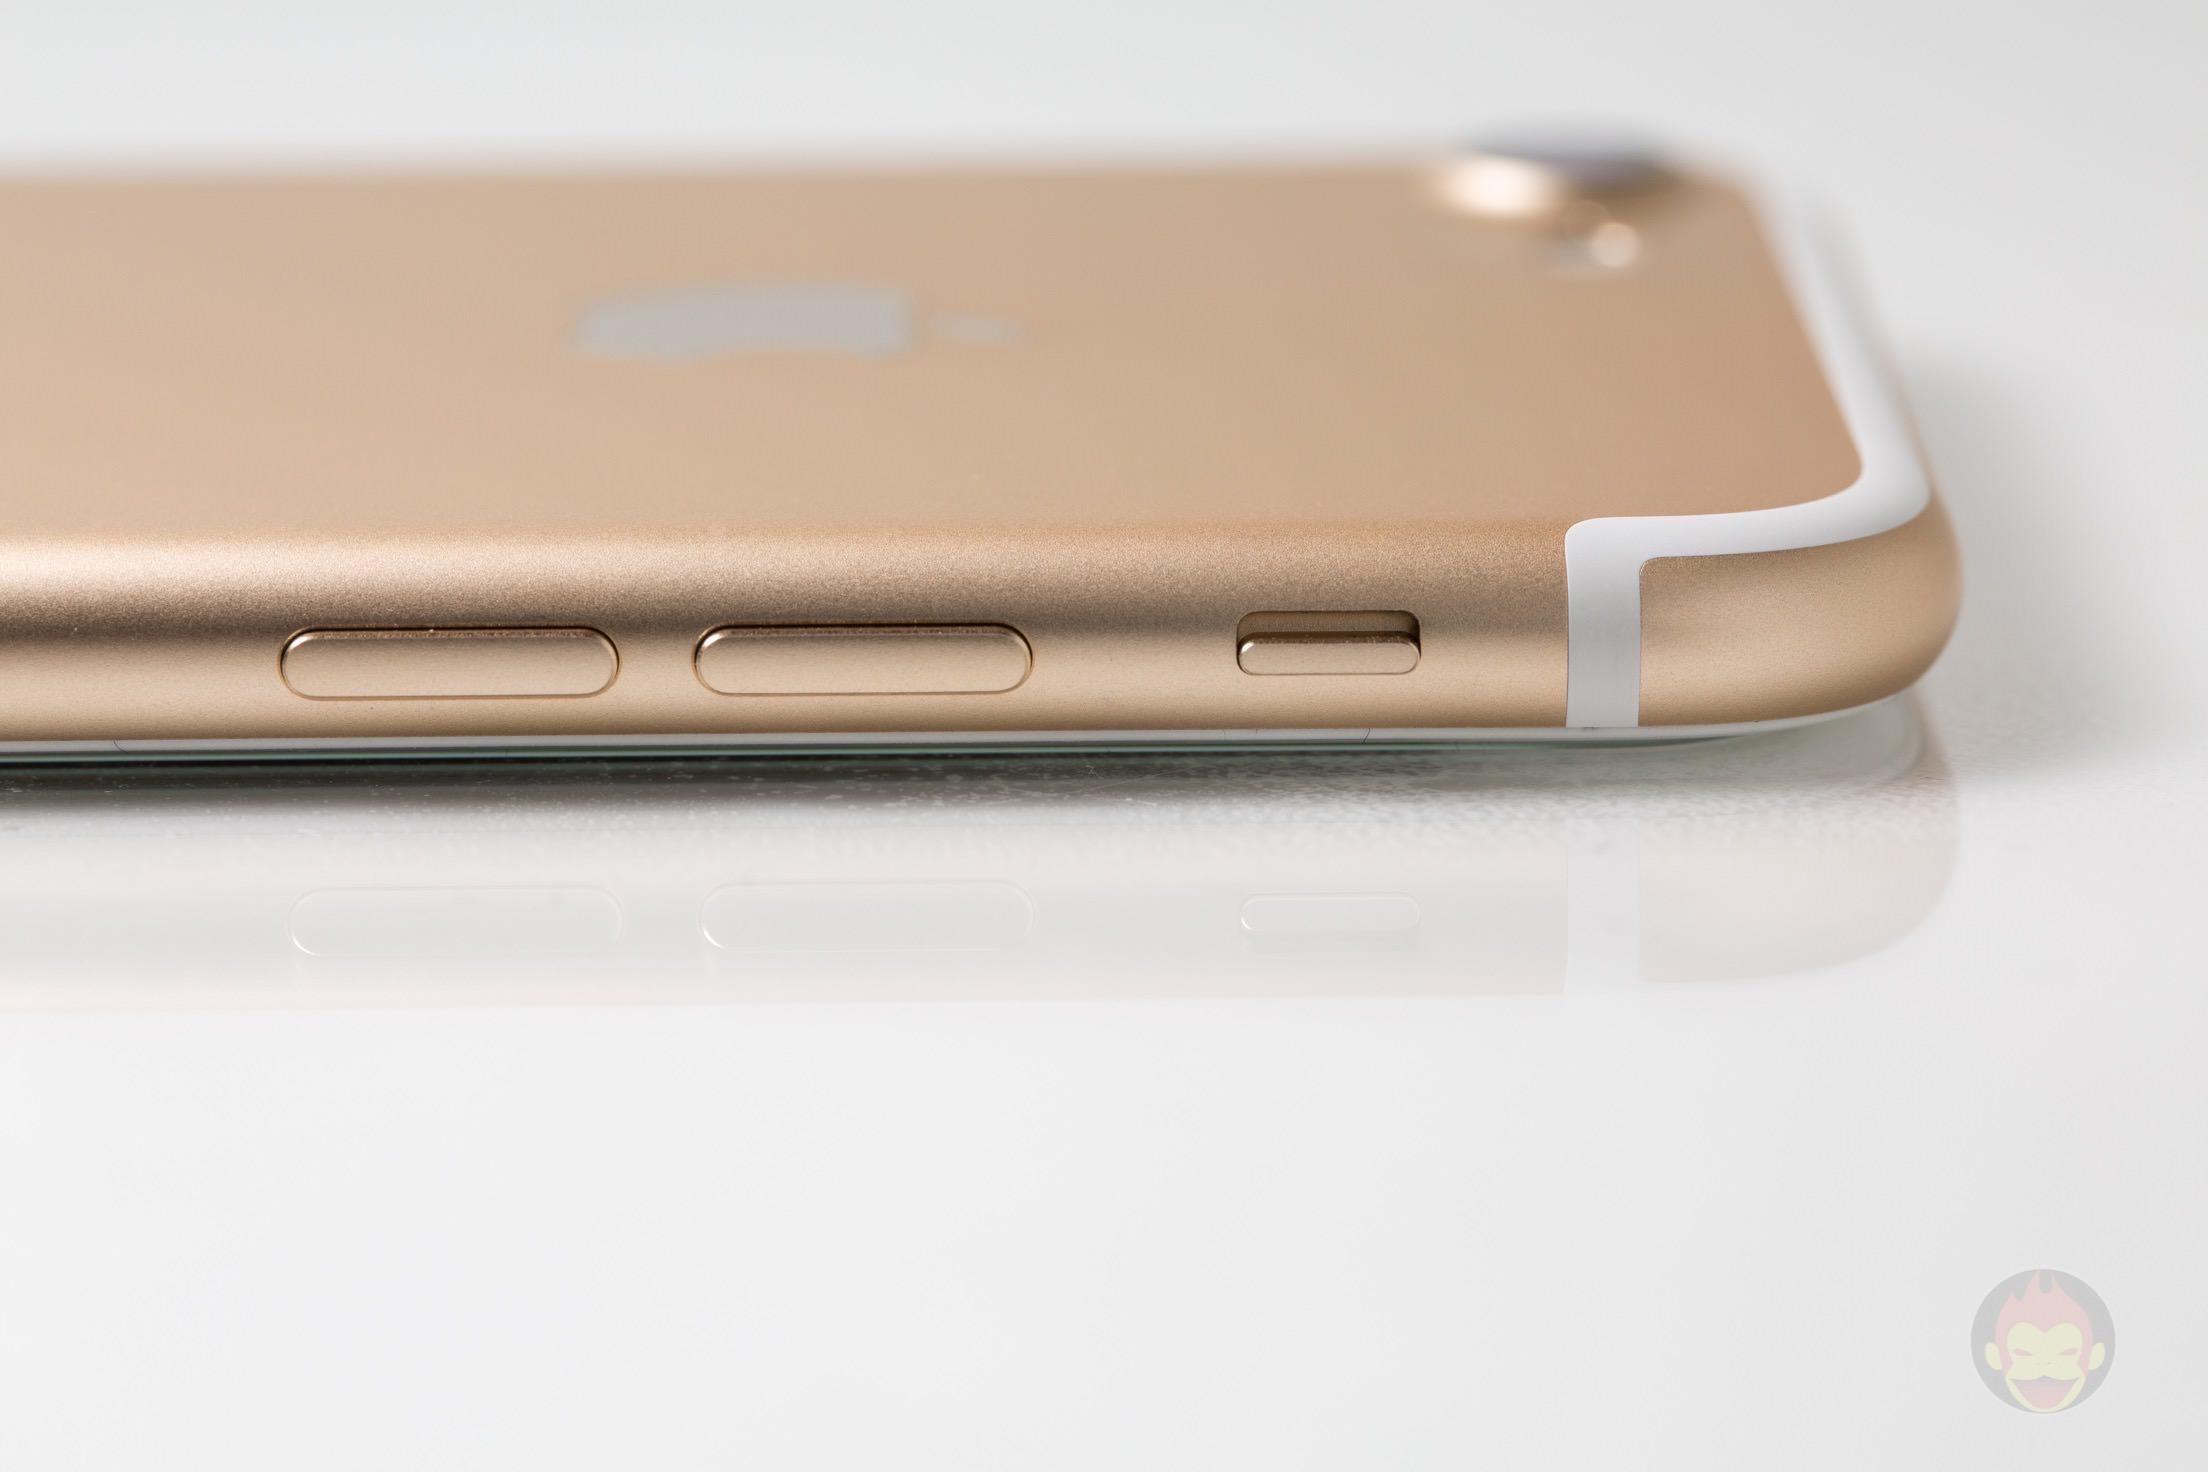 iPhone-7-Gold-Model-20.jpg